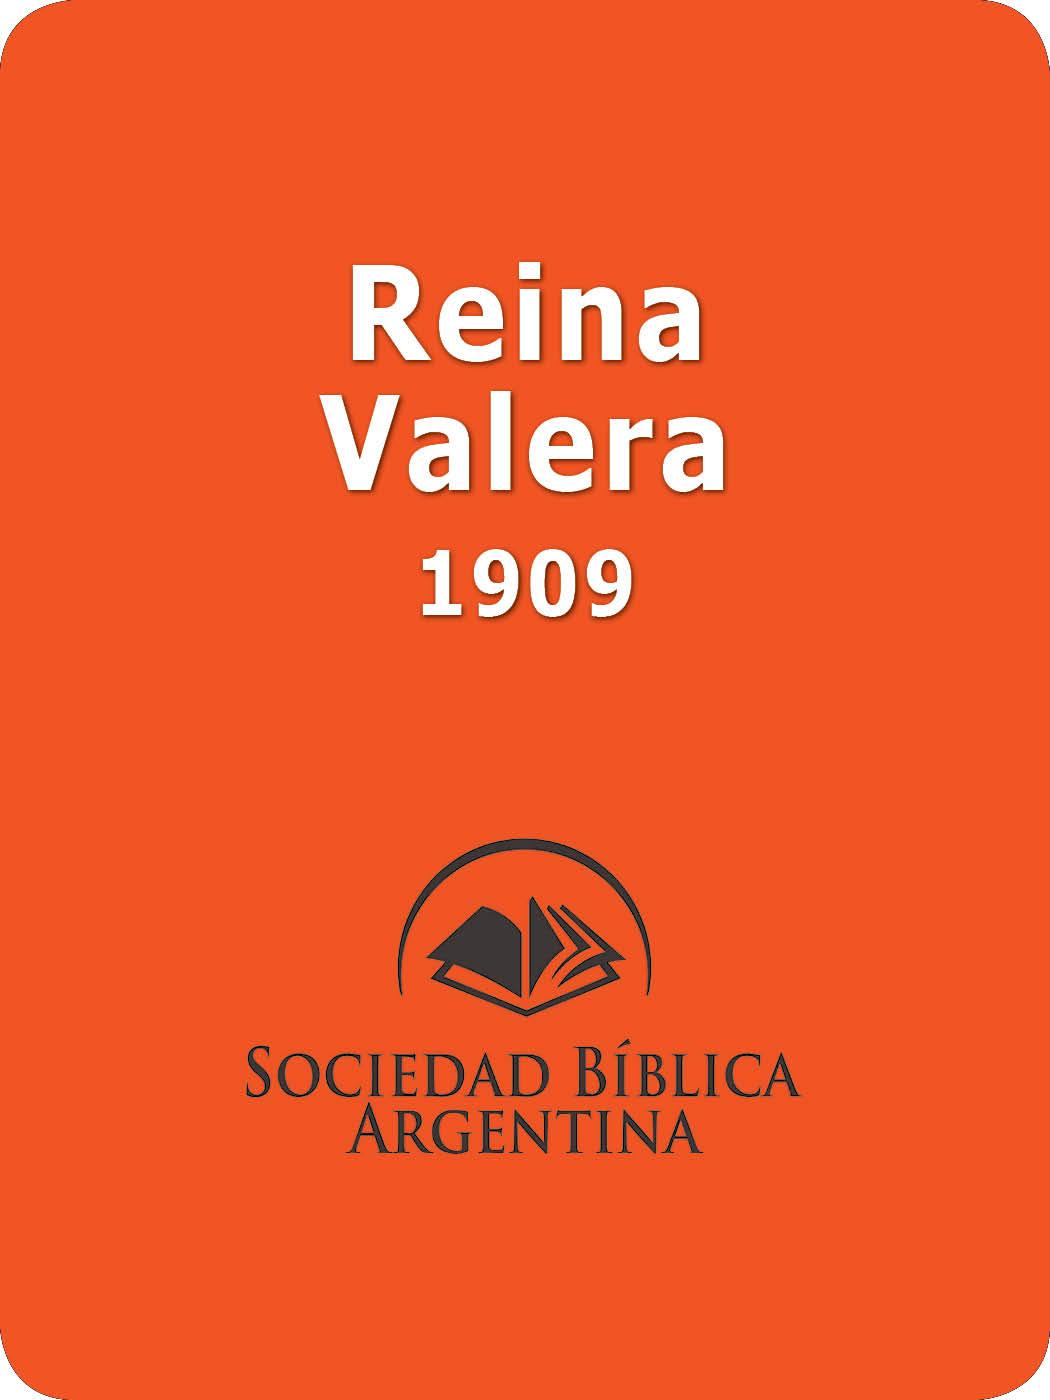 Reina Valera Bible 1909